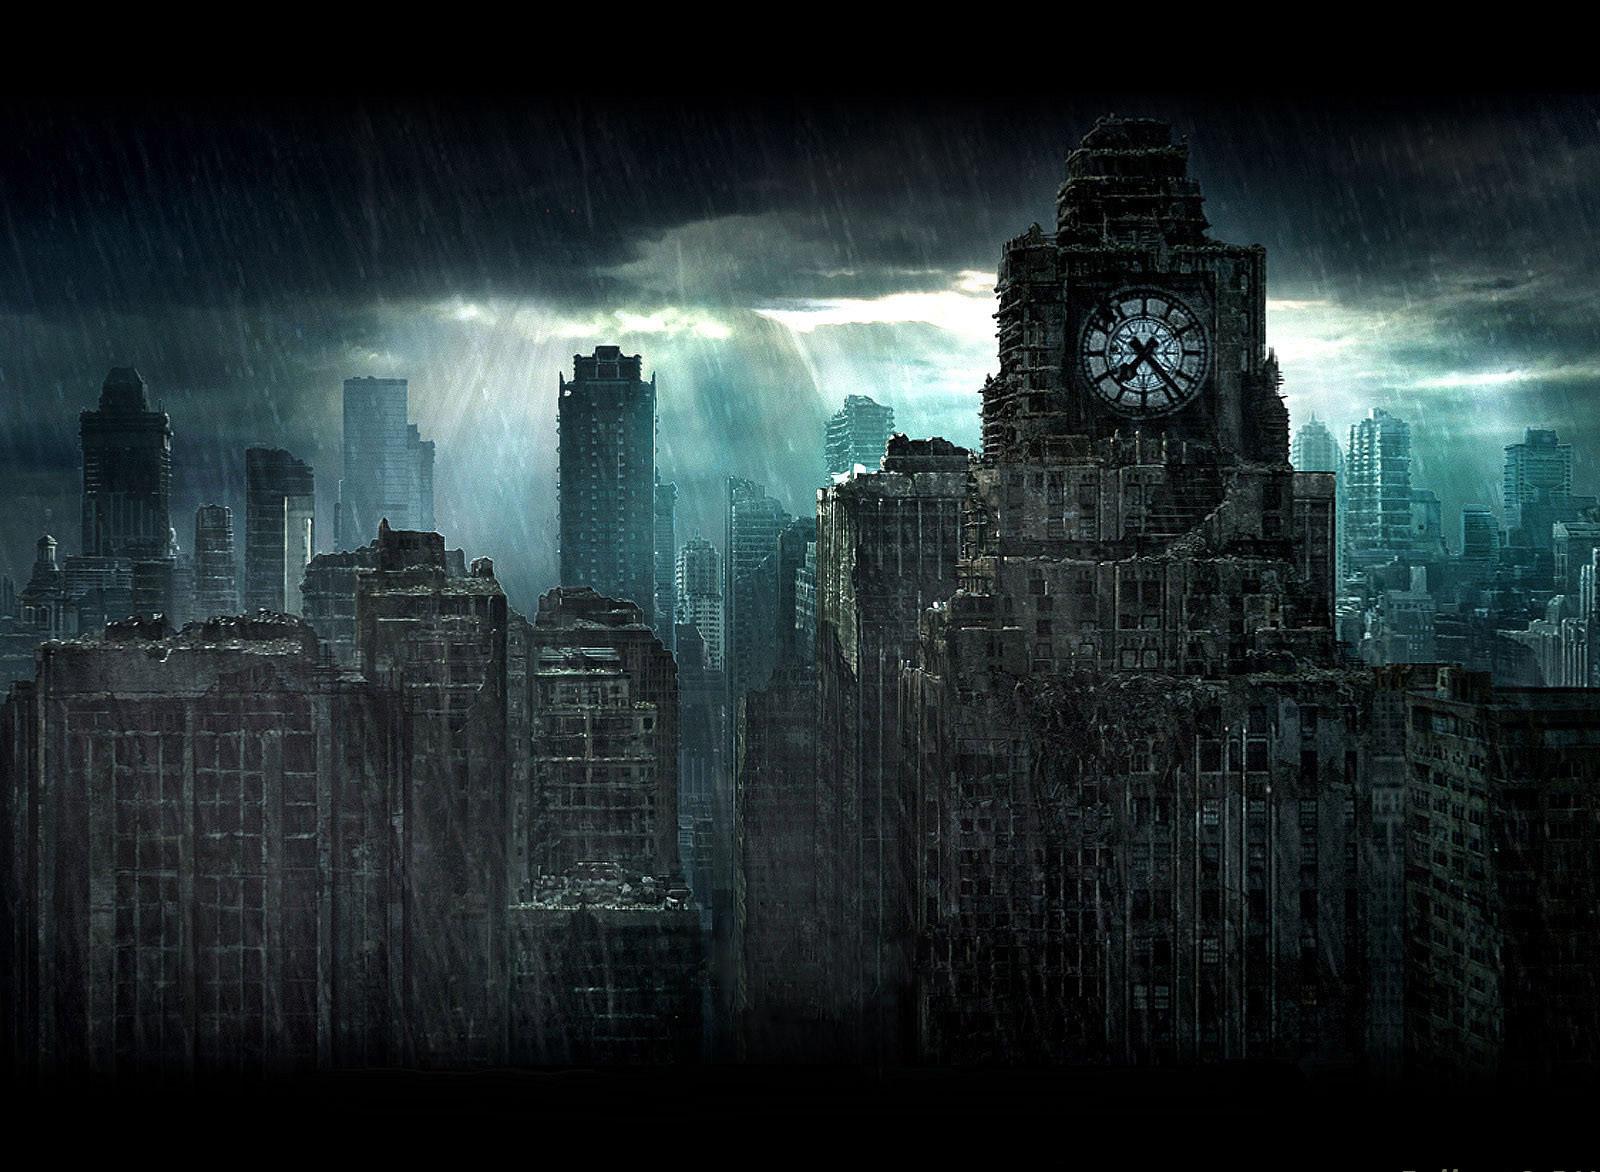 http://3.bp.blogspot.com/-wjiybscffz8/T5Qf9Dp8zFI/AAAAAAAAA1w/0xo2c7opOk4/s1600/dark-rainy-city.jpg